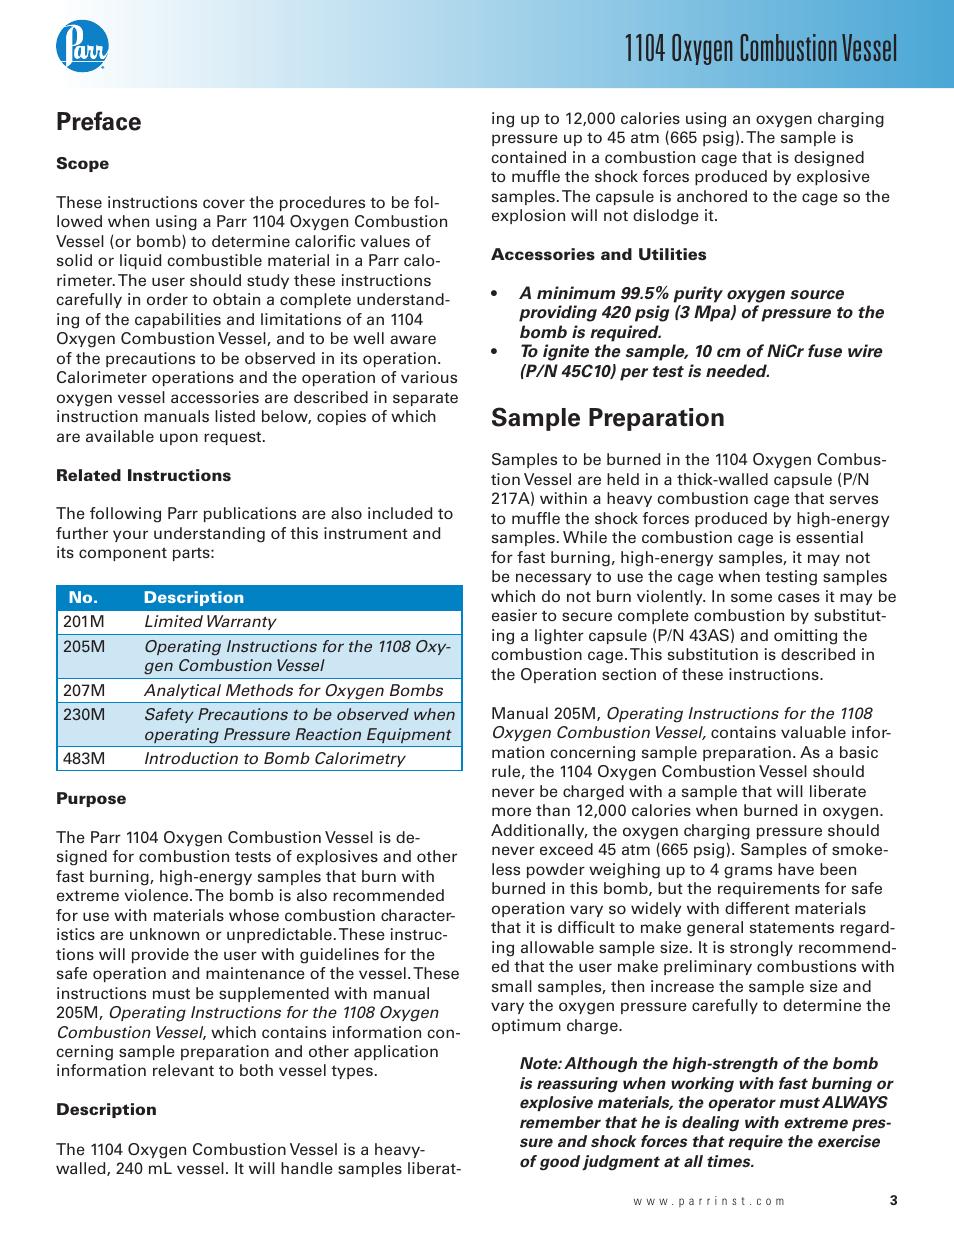 preface sample preparation 1104 oxygen combustion vessel parr rh manualsdir com